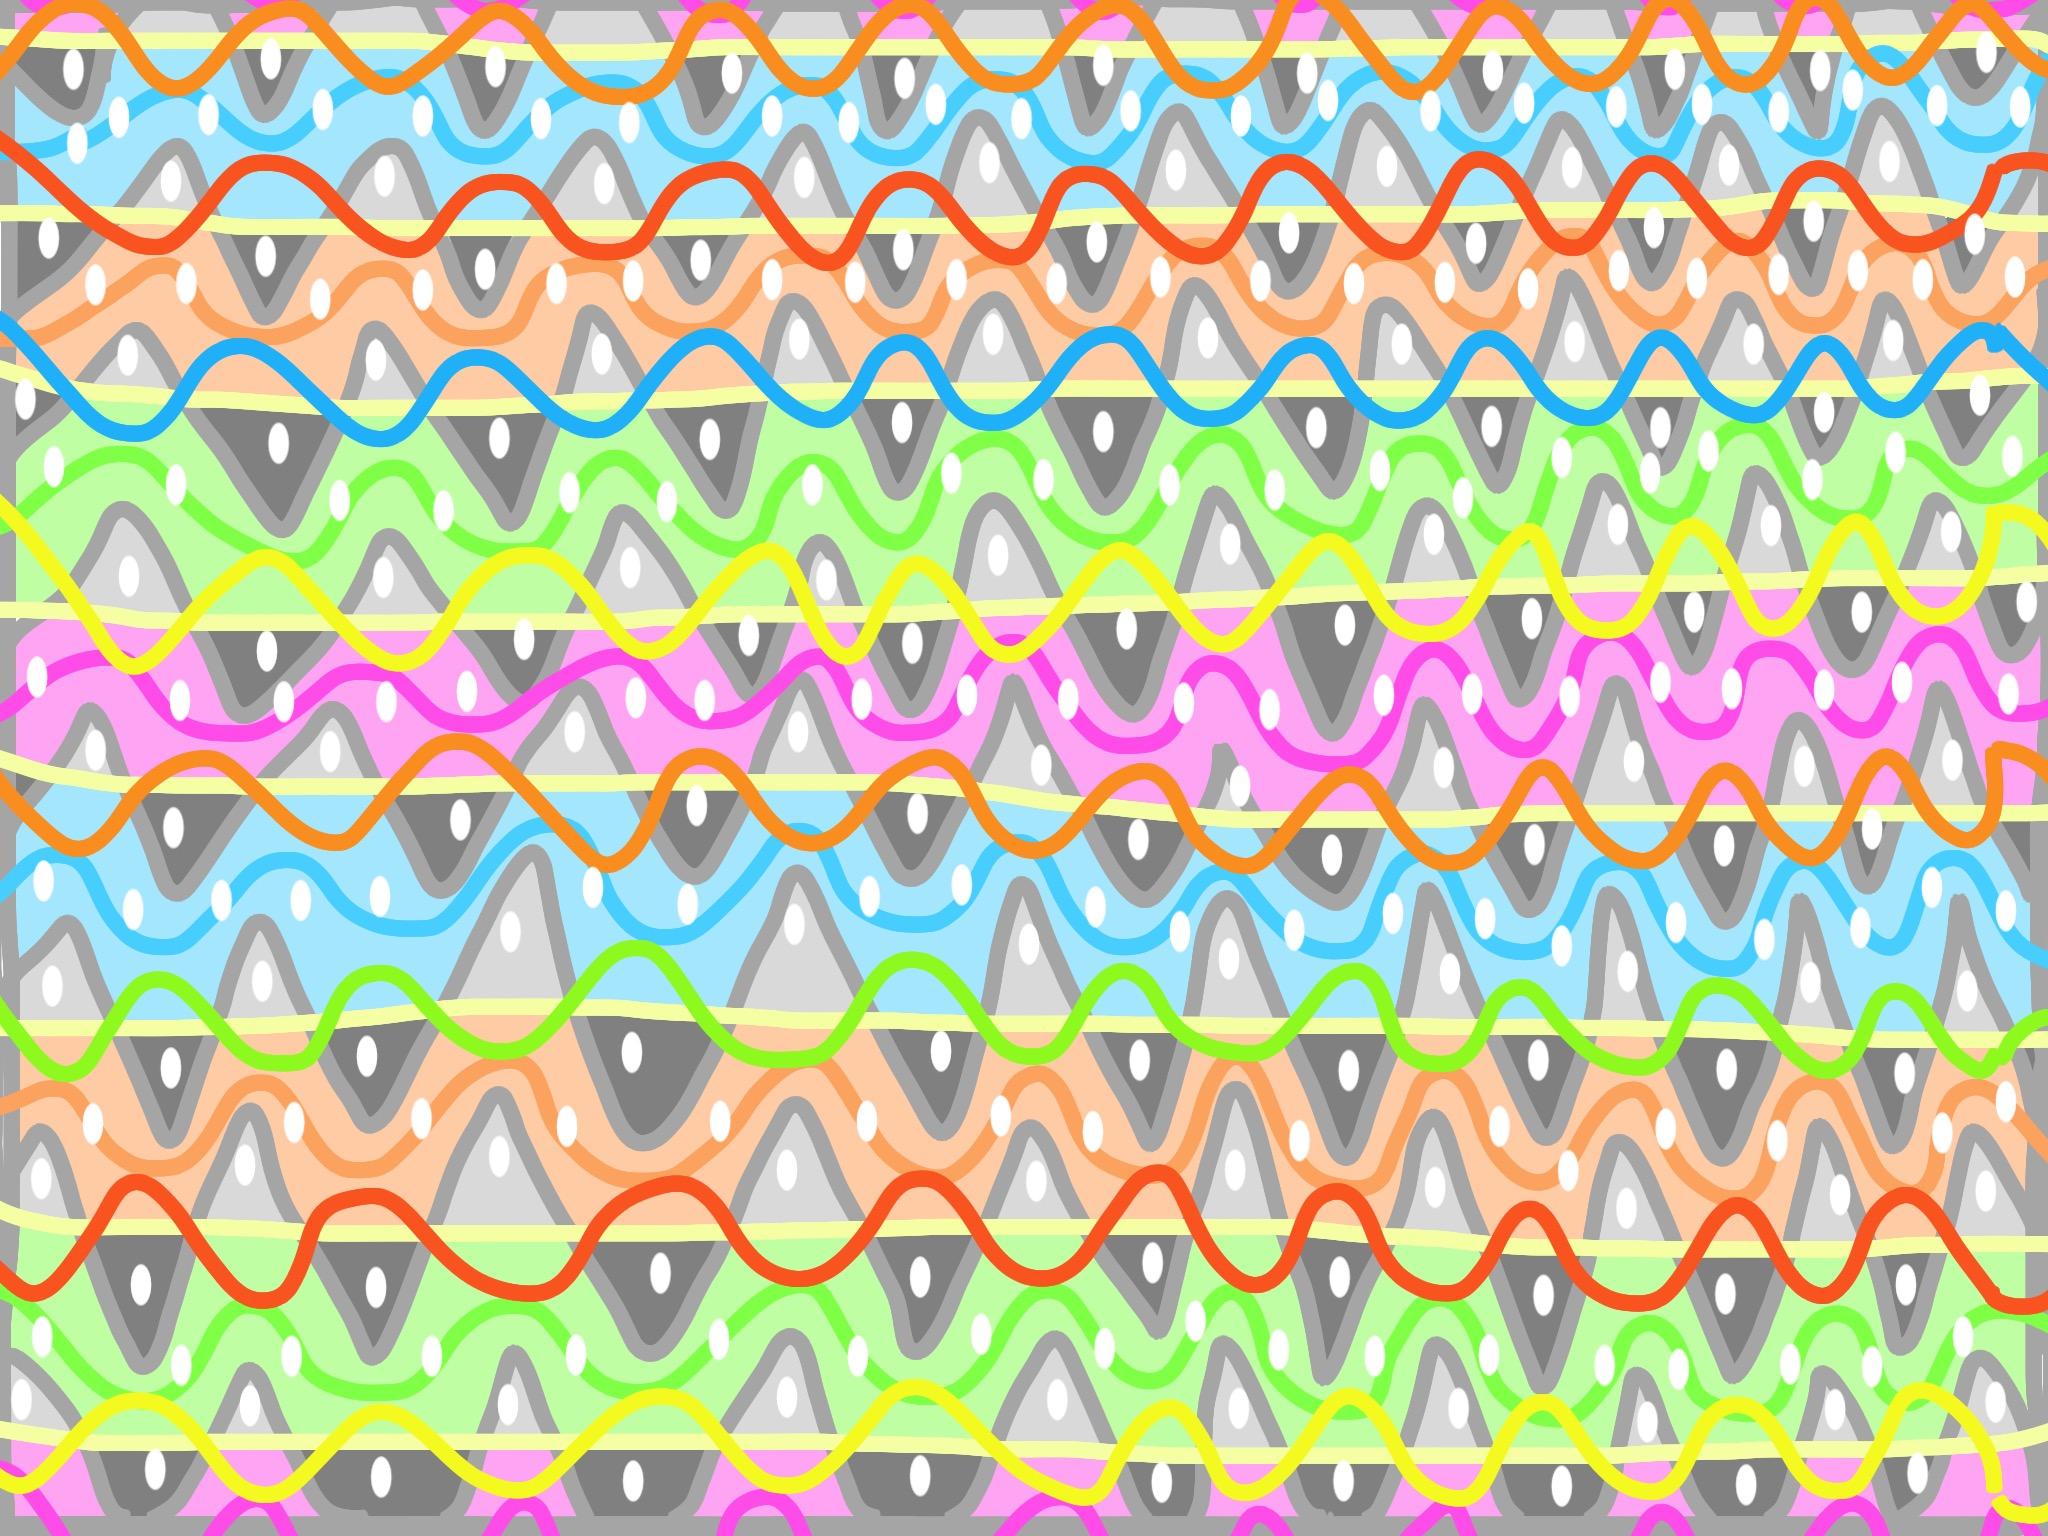 Pattern #11